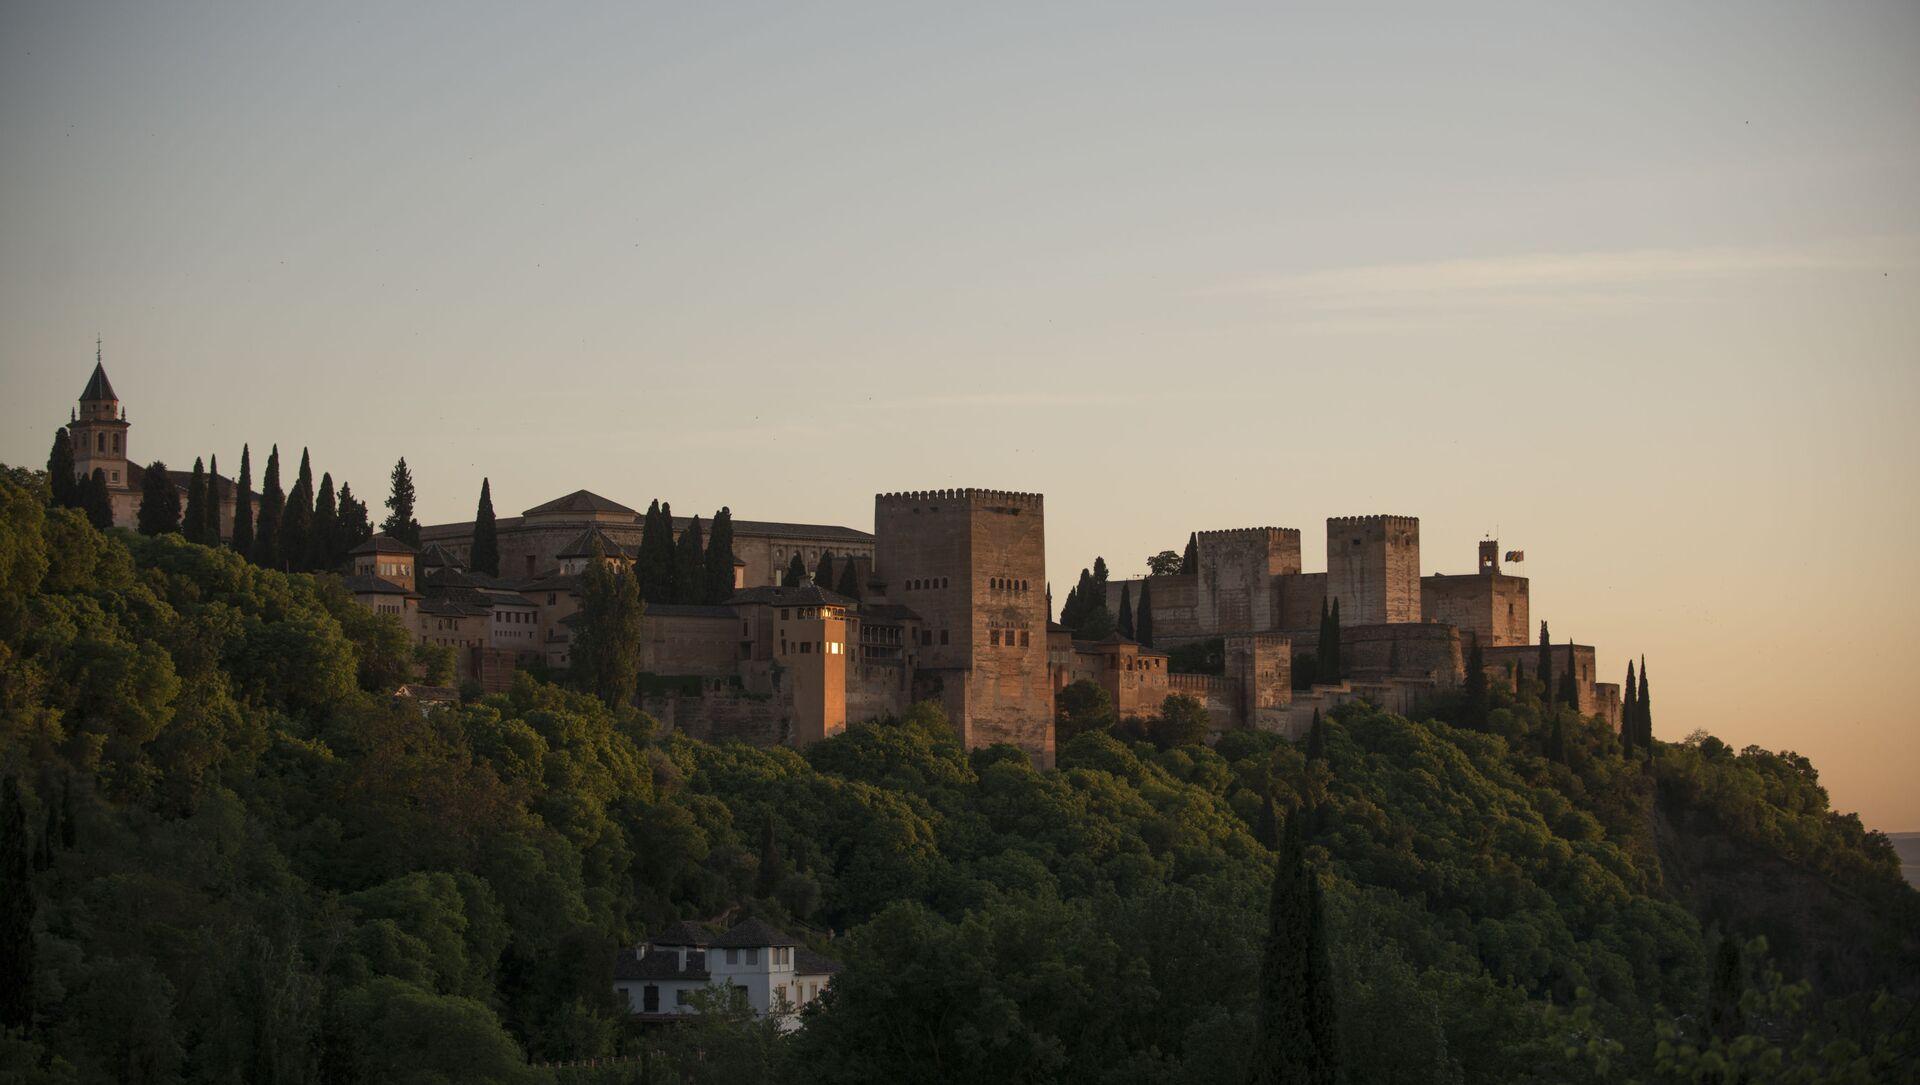 Vista general de la Alhambra de Granada. 2 de mayo de 2020. - Sputnik Mundo, 1920, 28.01.2021